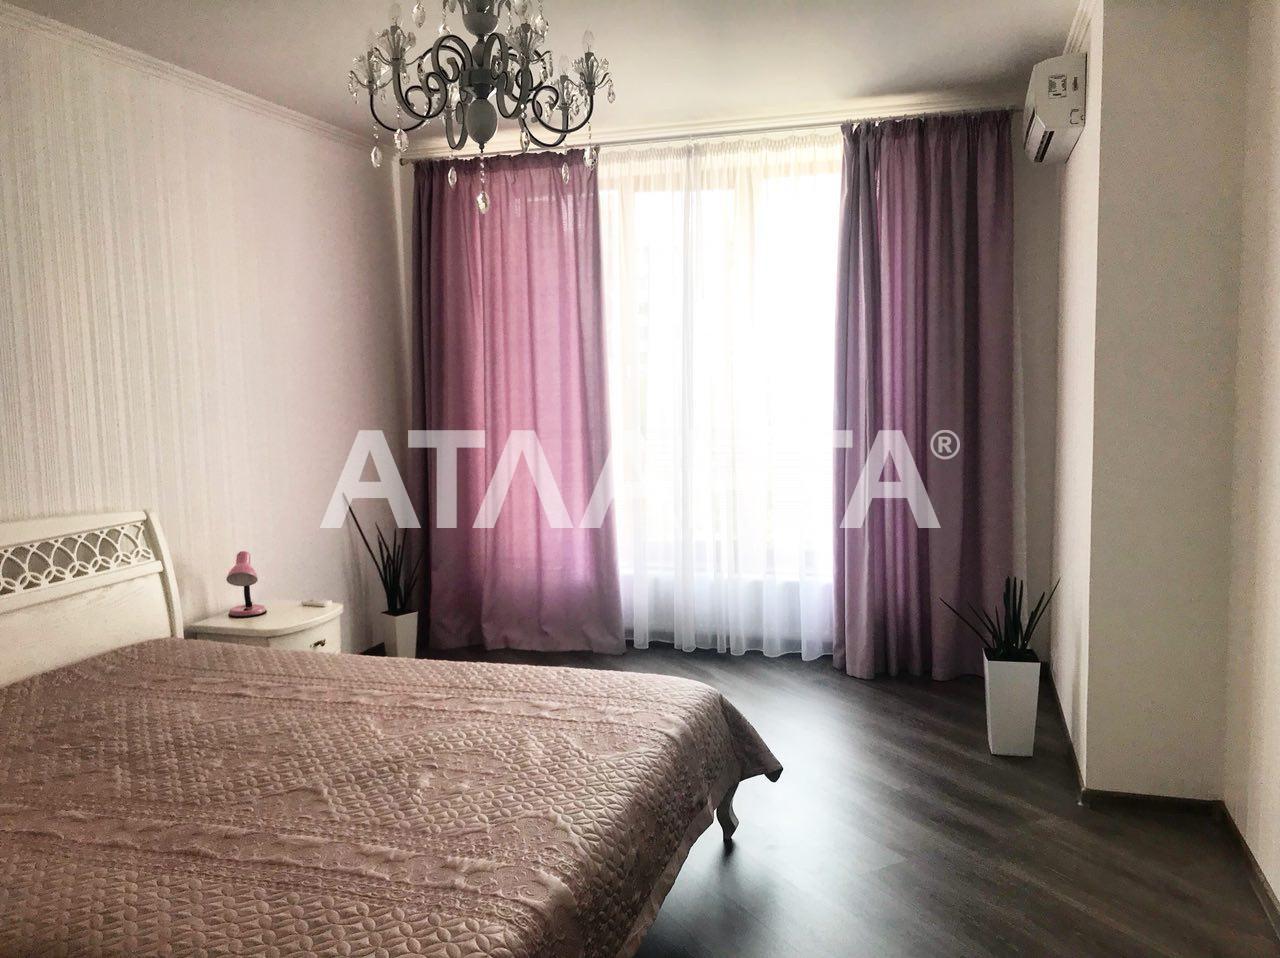 Продается 1-комнатная Квартира на ул. Говорова Марш. — 110 000 у.е.